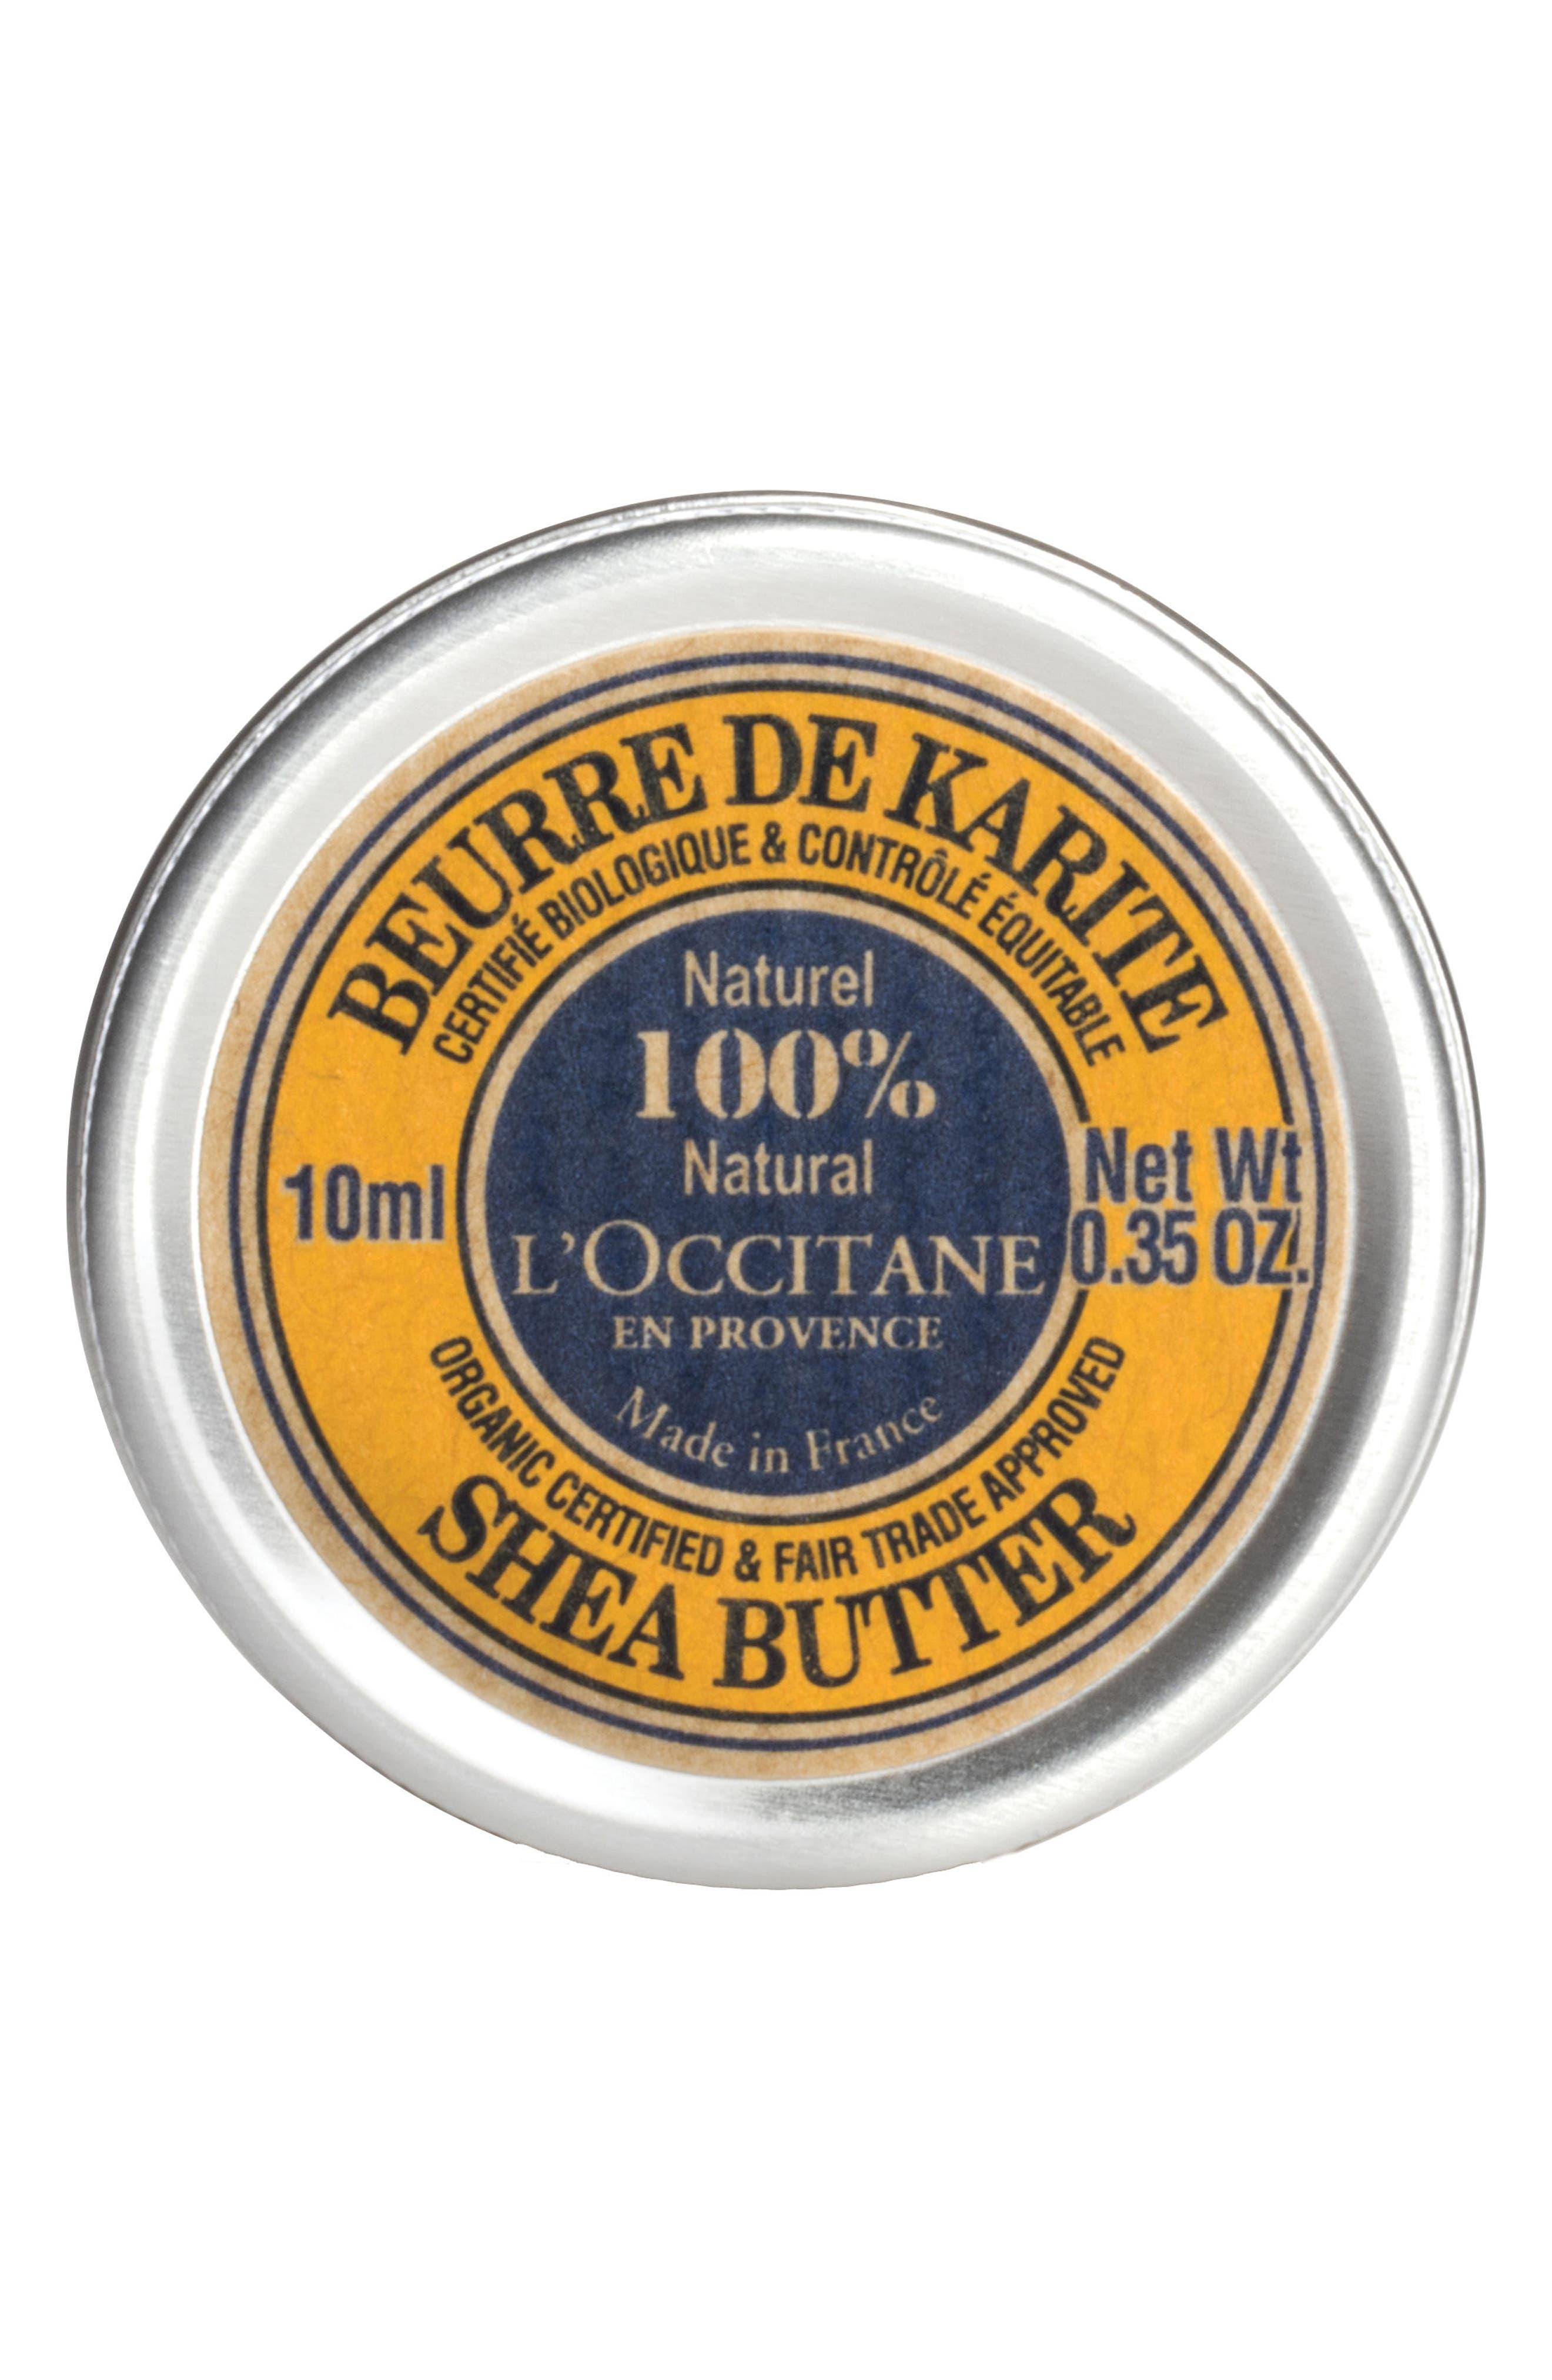 Mini Pure Shea Butter,                         Main,                         color, 000